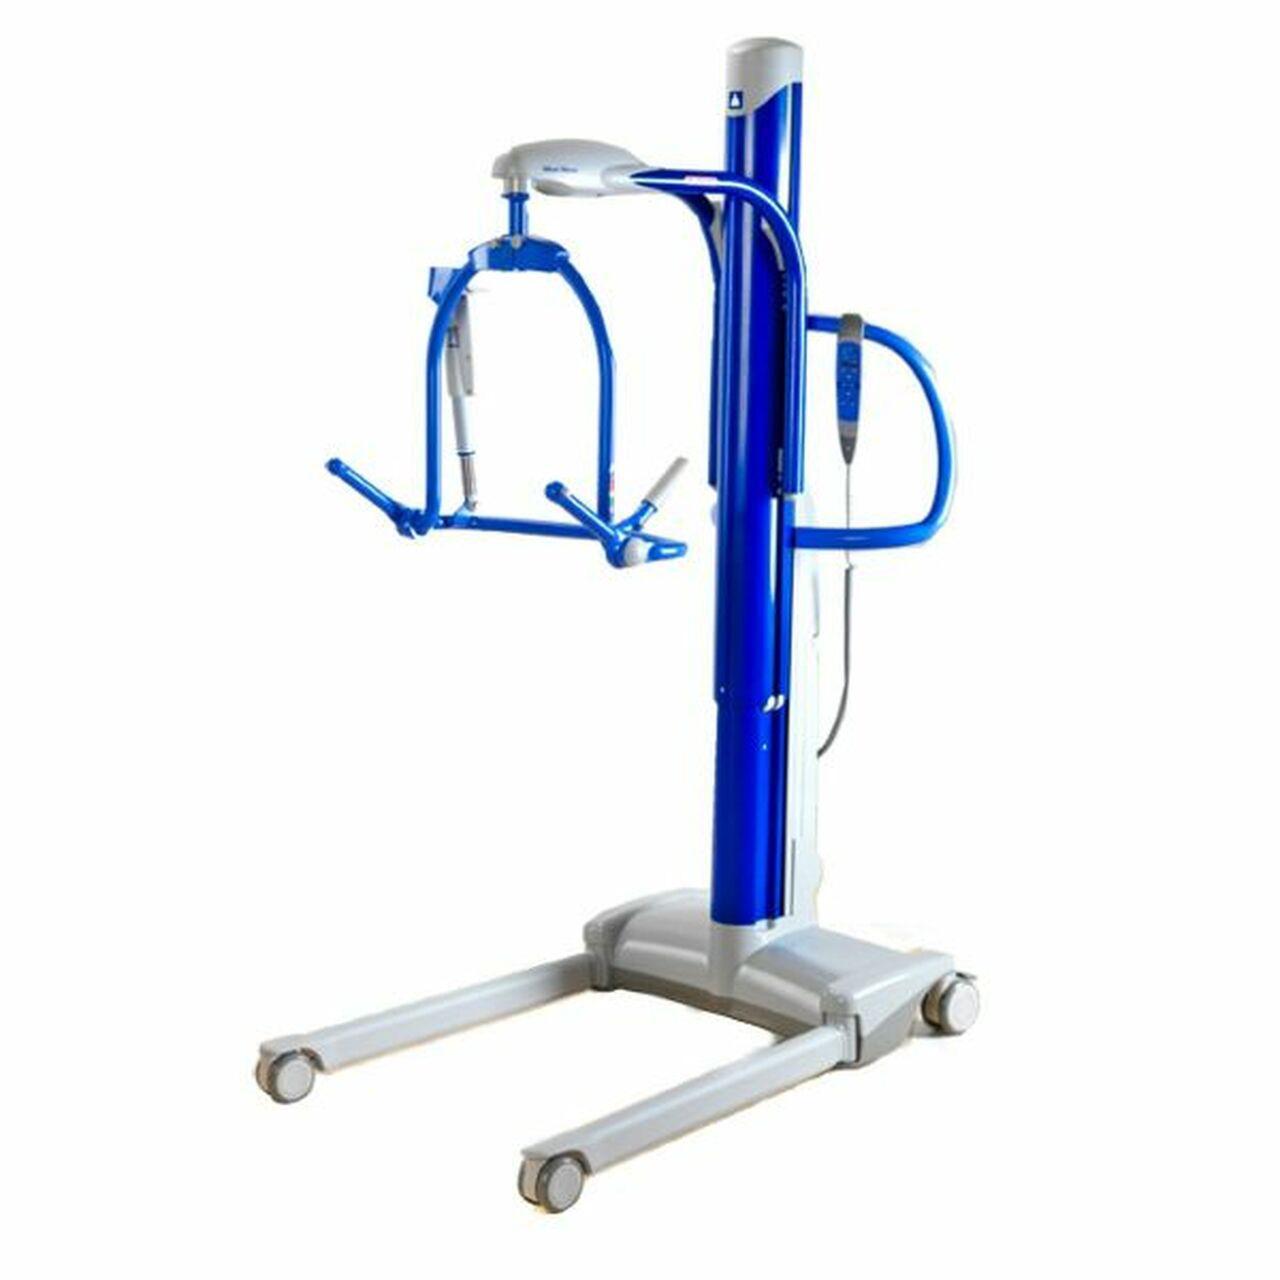 Arjo Maxi Move power patient lift